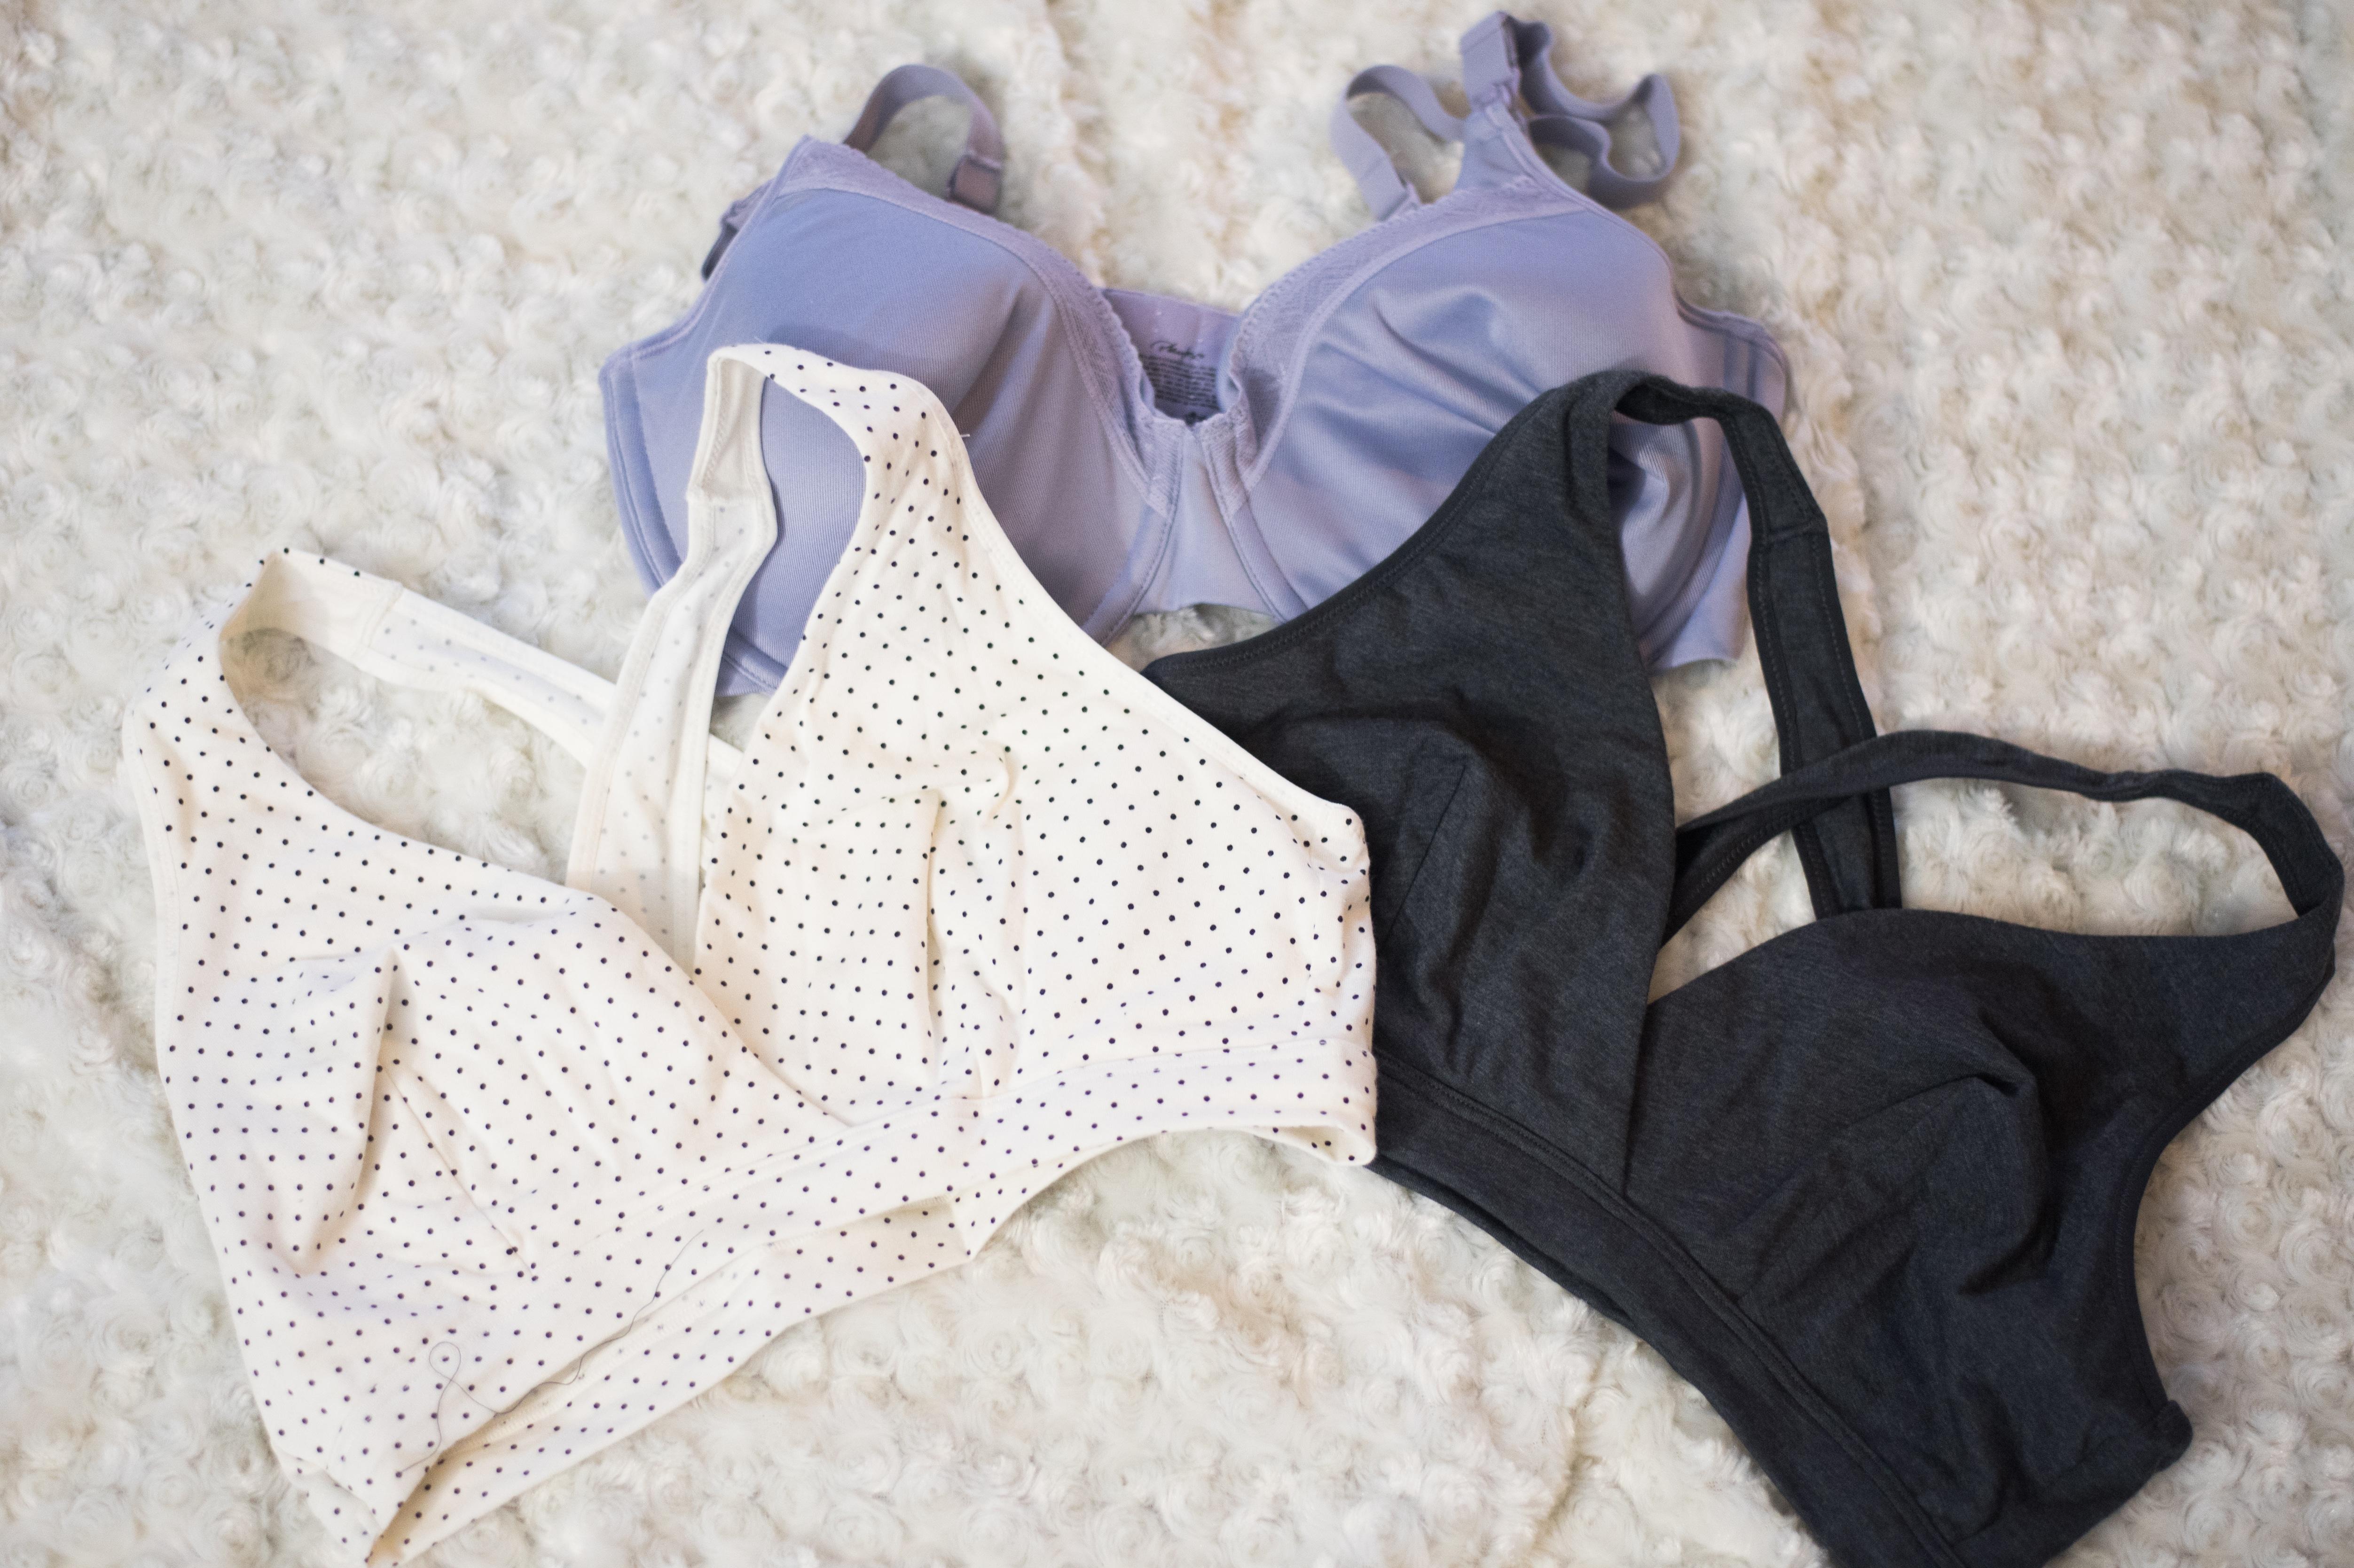 labor and delivery nursing bras